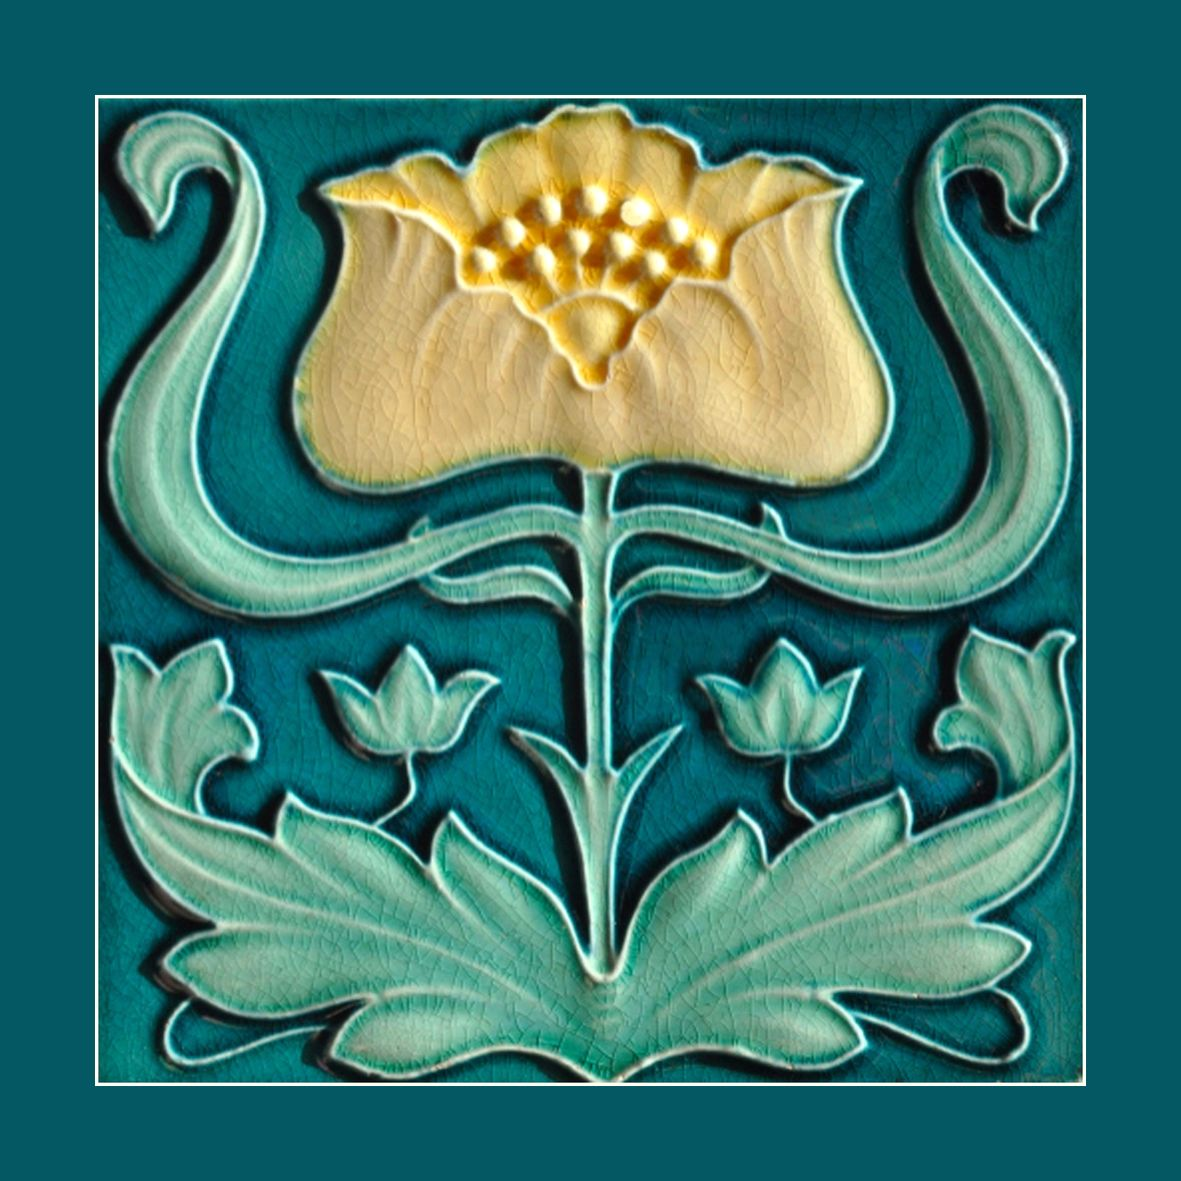 22 original art nouveau tile by j c edwards 1907 courtesy of 22 original art nouveau tile by j c edwards 1907 courtesy of robert smith dailygadgetfo Images